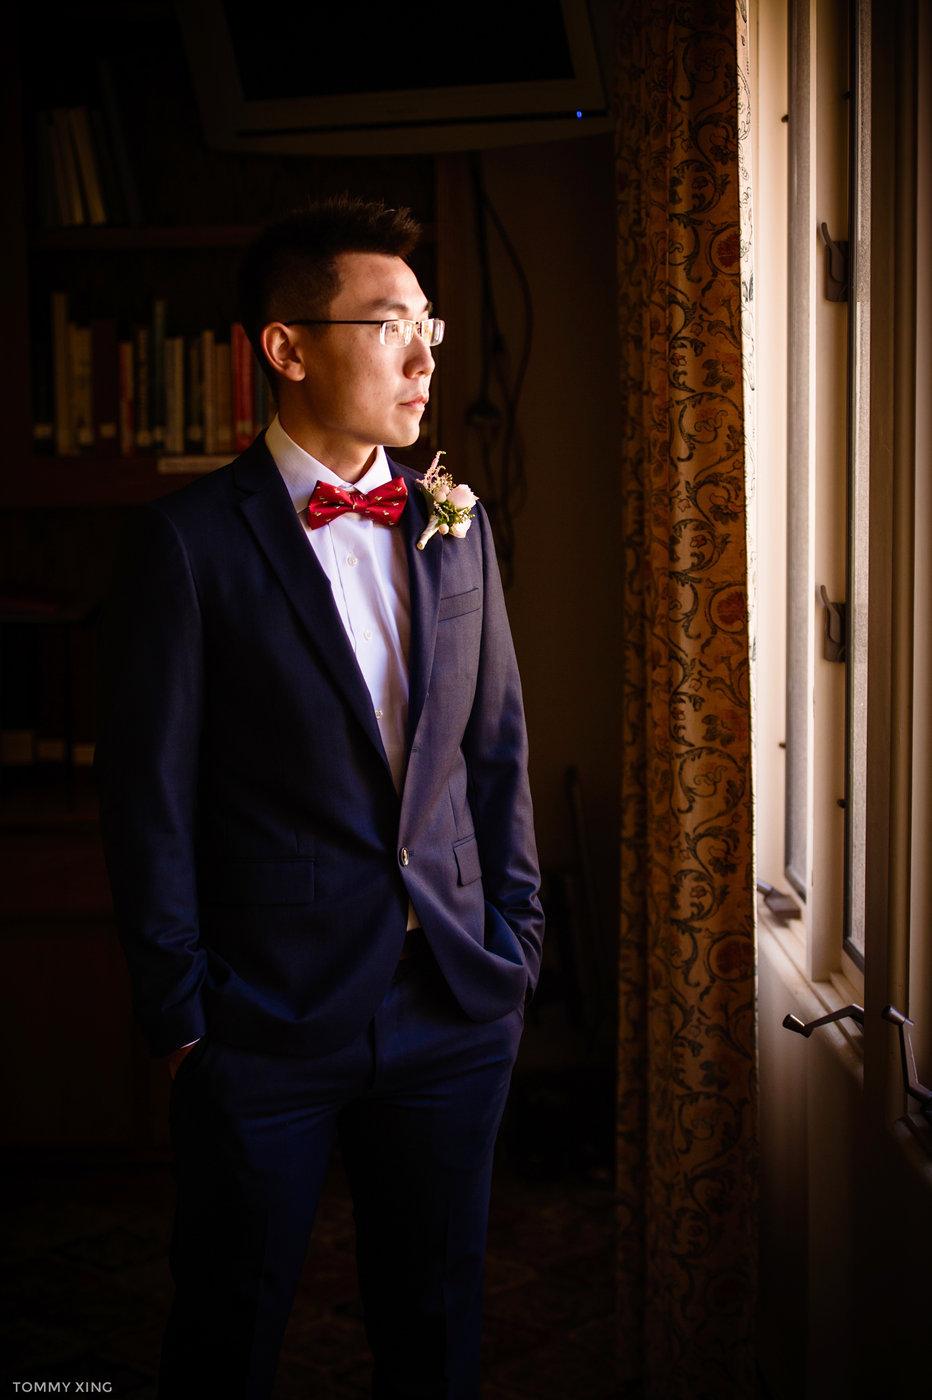 Neighborhood Church Wedding Ranho Palos Verdes Los Angeles Tommy Xing Photography 洛杉矶旧金山婚礼婚纱照摄影师 014.jpg